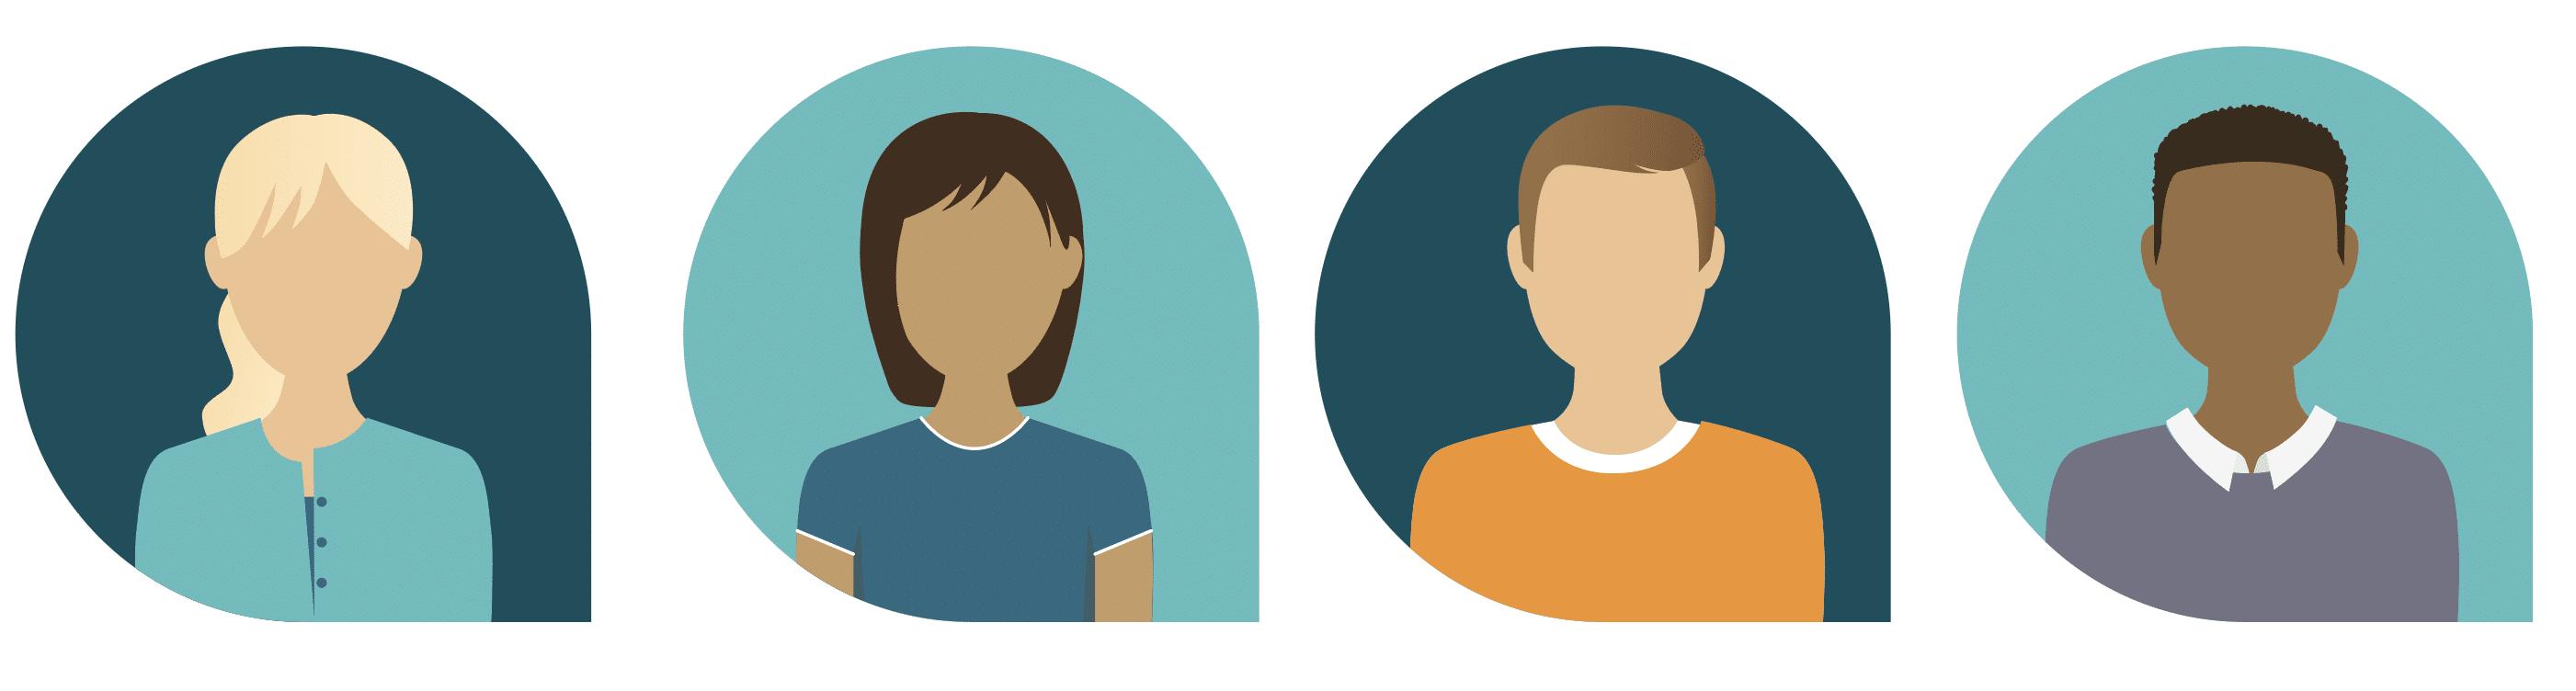 buyer-personas-image